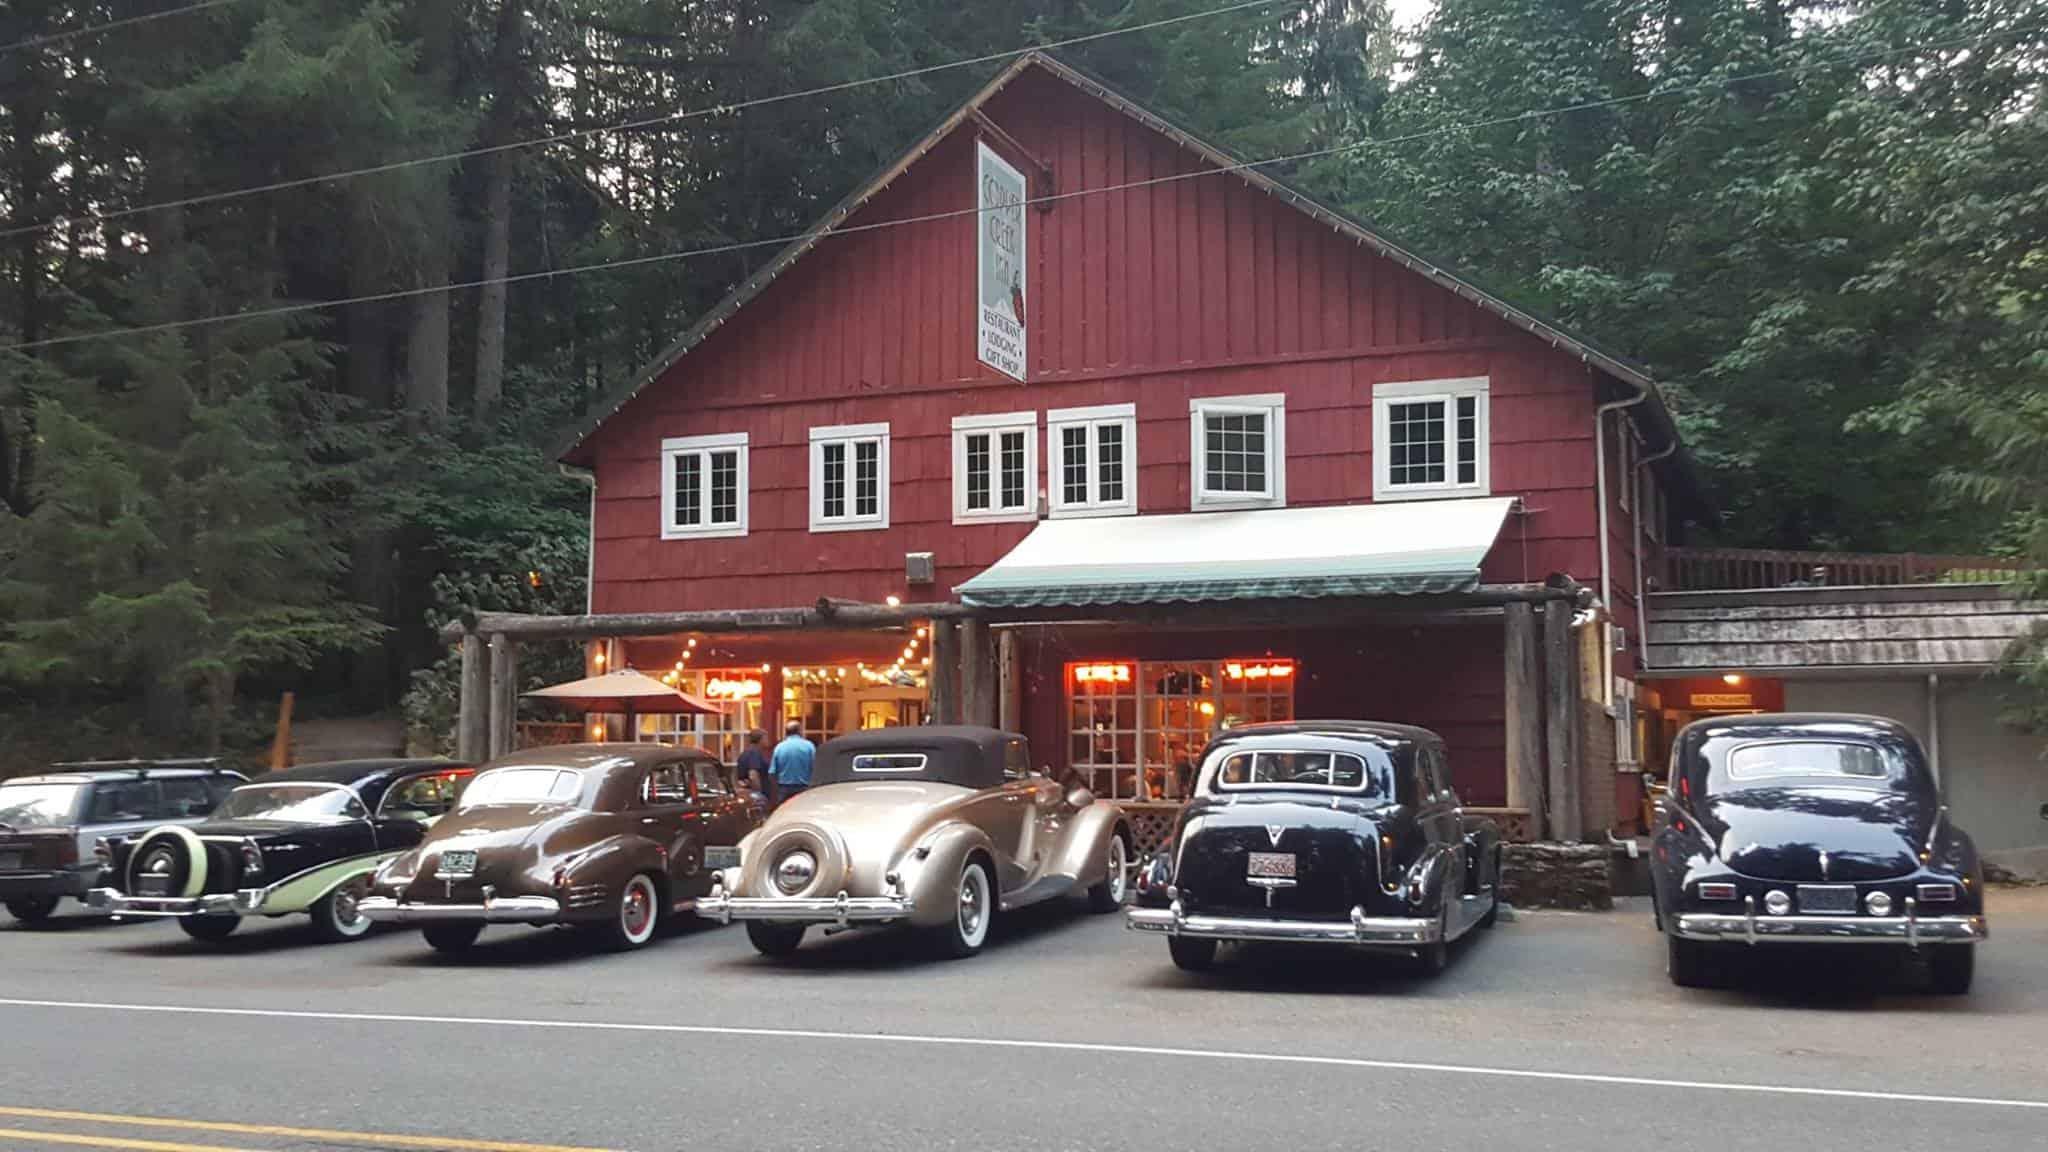 Copper Creek Exterior with Car Club